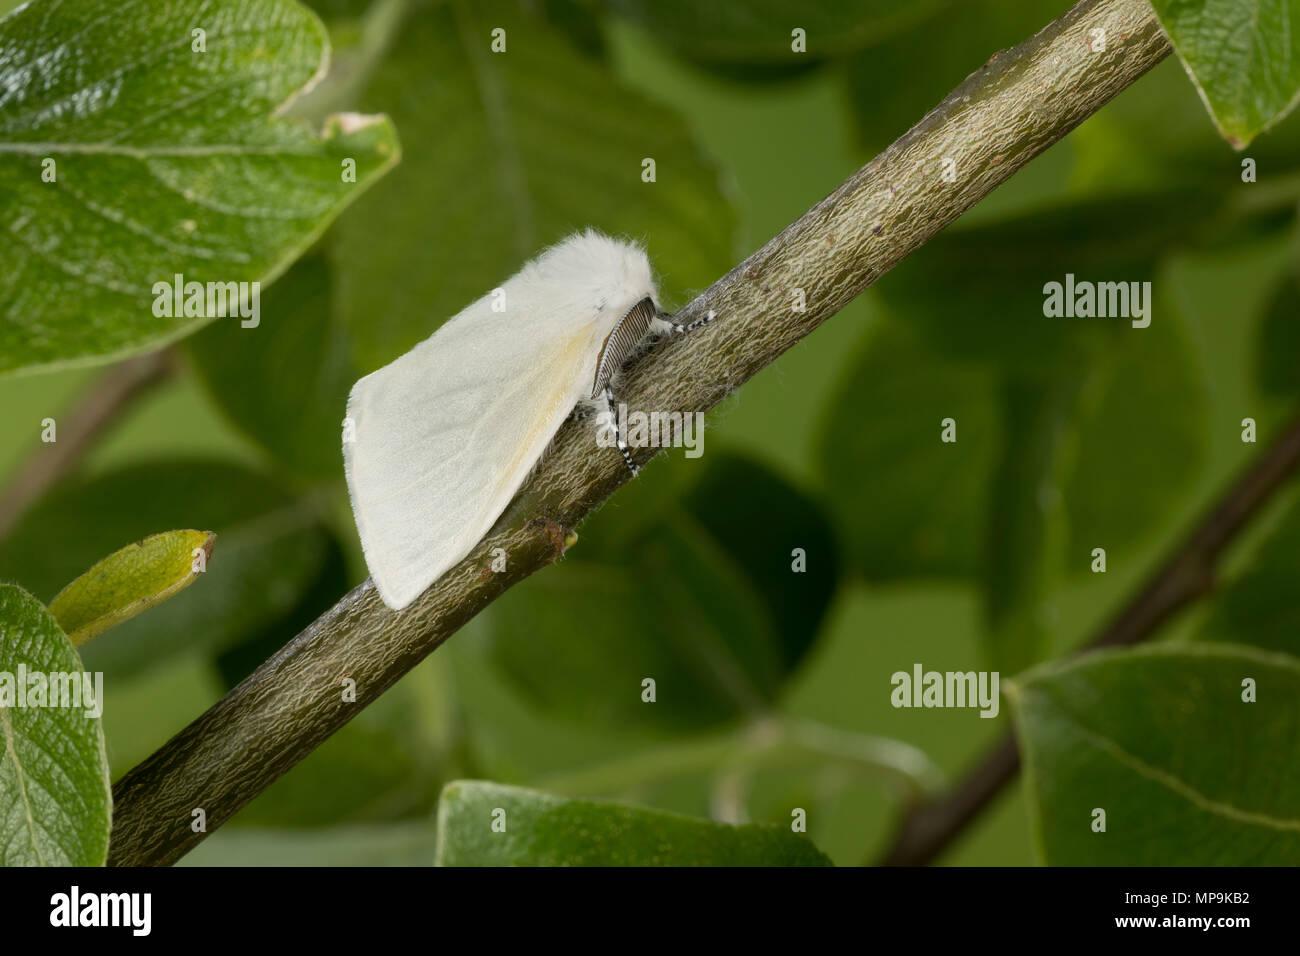 Pappelspinner, Pappel-Trägspinner, Pappel-Spinner, Atlasspinner, Atlas, Weidenspinner, Männchen, Leucoma salicis, Stilpnotia salicis, satin moth, Whit - Stock Image